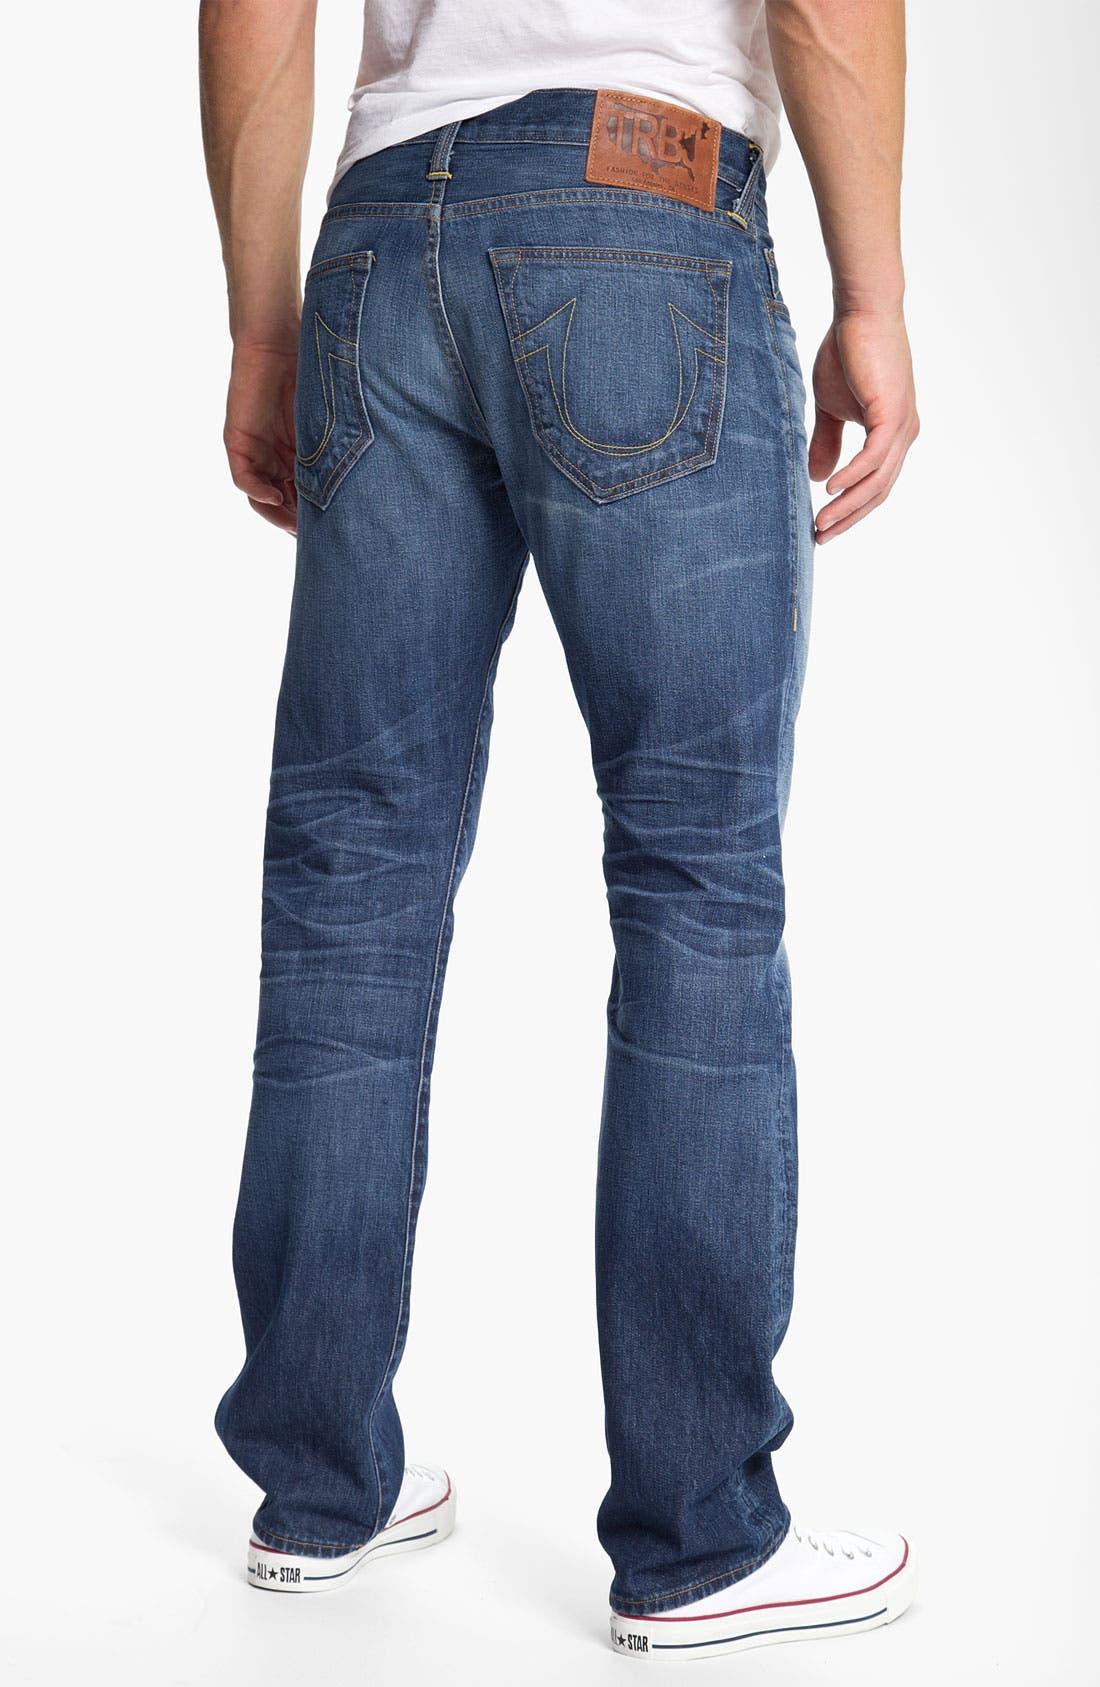 Main Image - True Religion Brand Jeans 'Bobby Phoenix' Straight Leg Jeans (Last Stand)